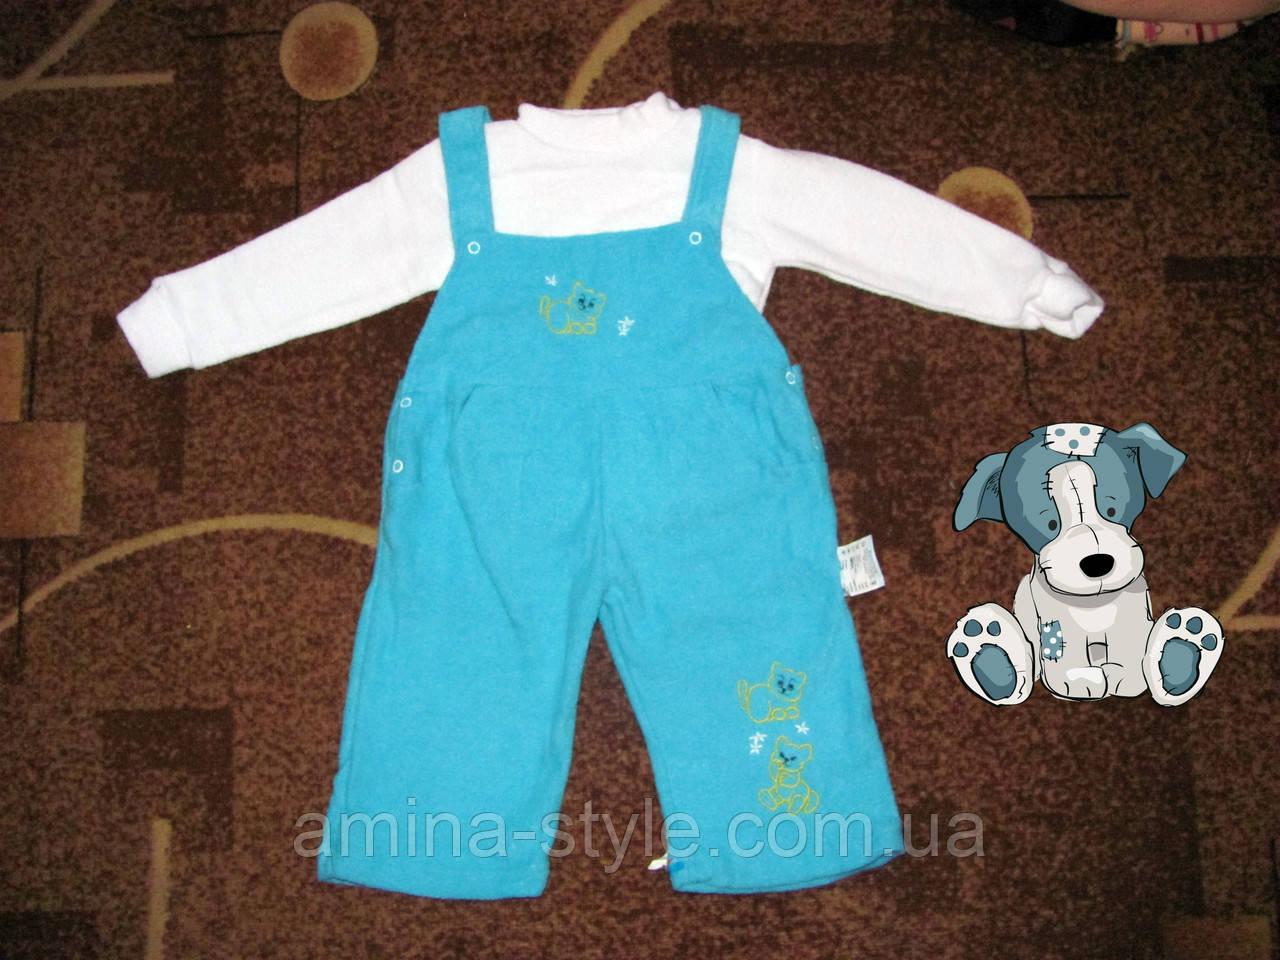 Комплект детский (водолазка + комбинезон) махра начес, 28 размер, фото 1